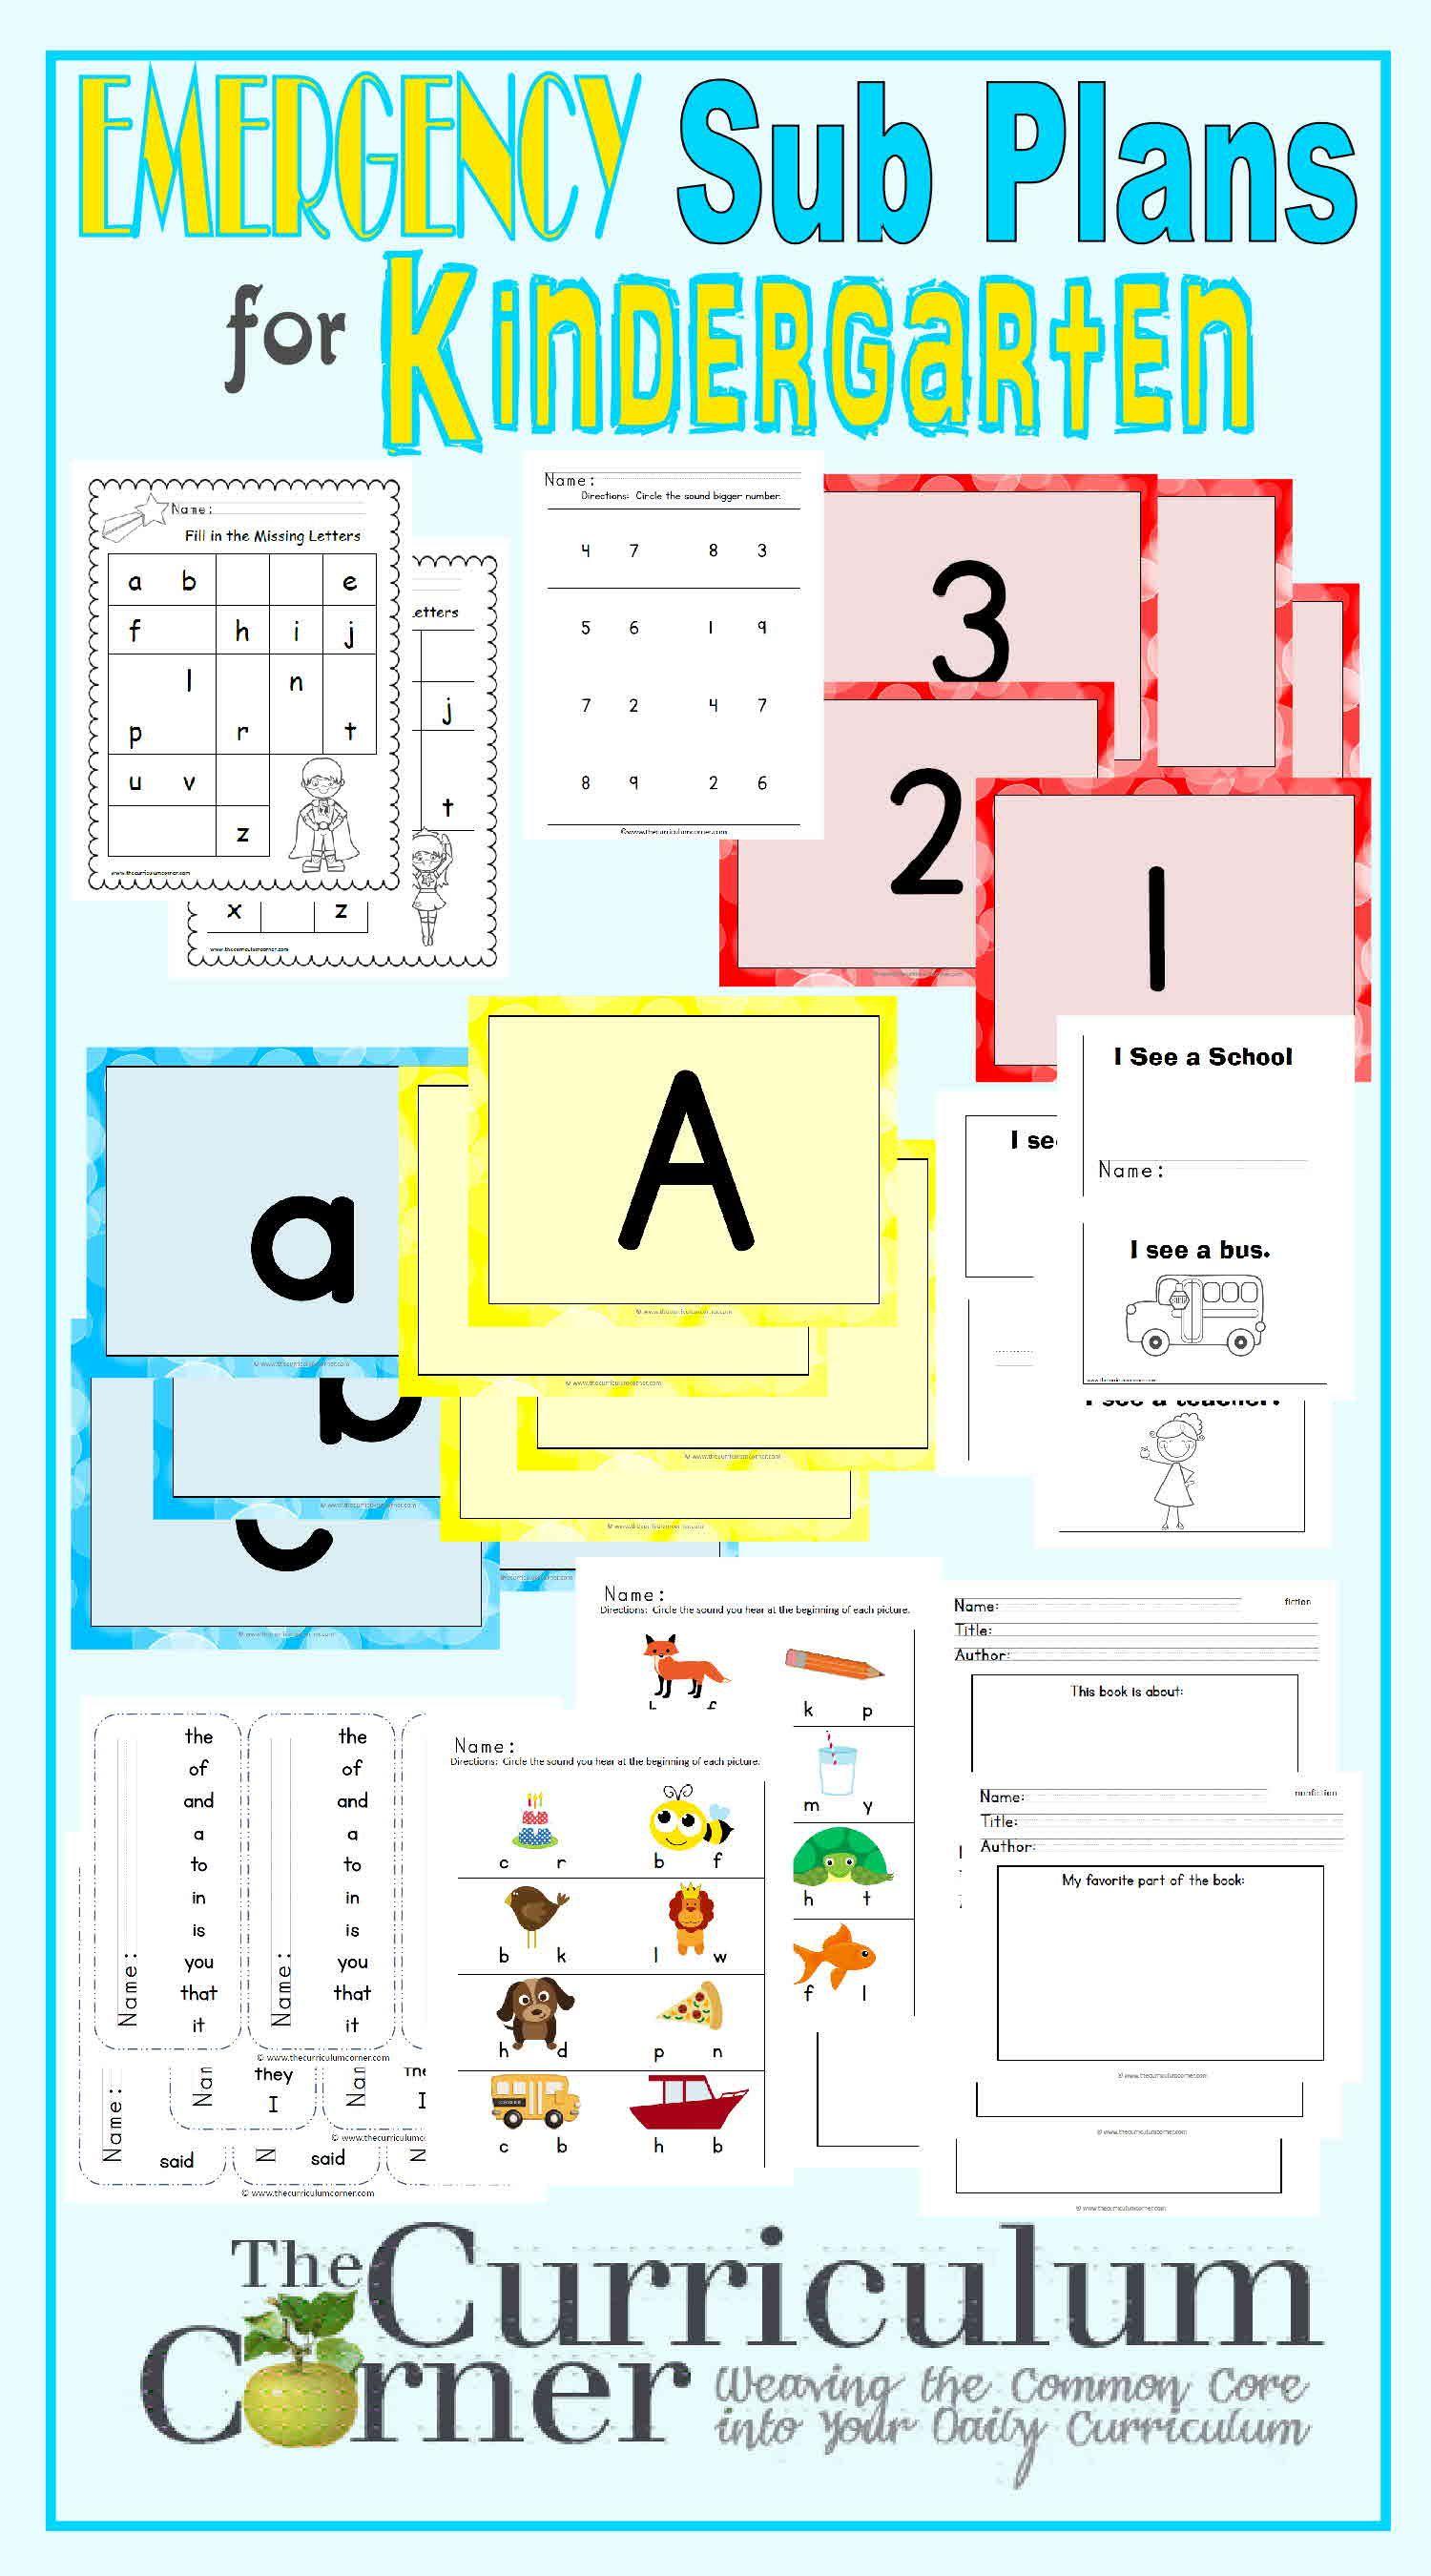 Kindergarten Emergency Sub Plans | Tk | Pinterest | Curriculums ...